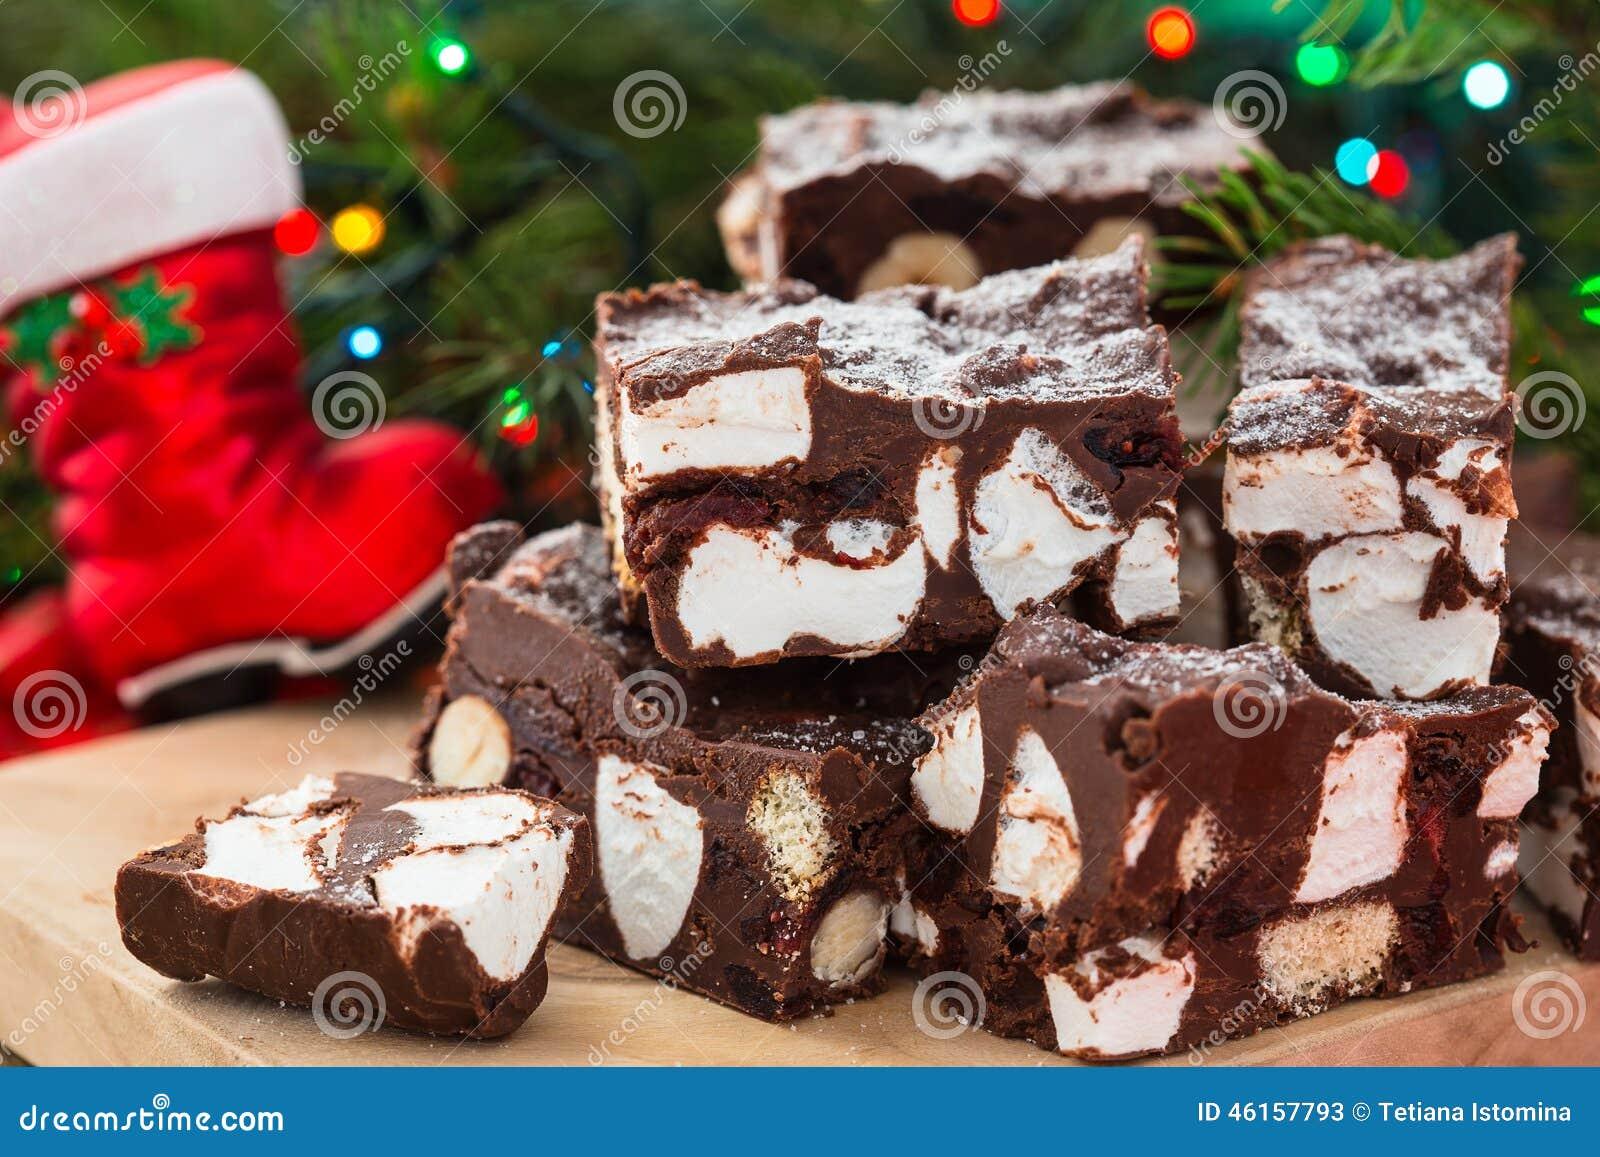 Chocolate And Marshmallow Bars